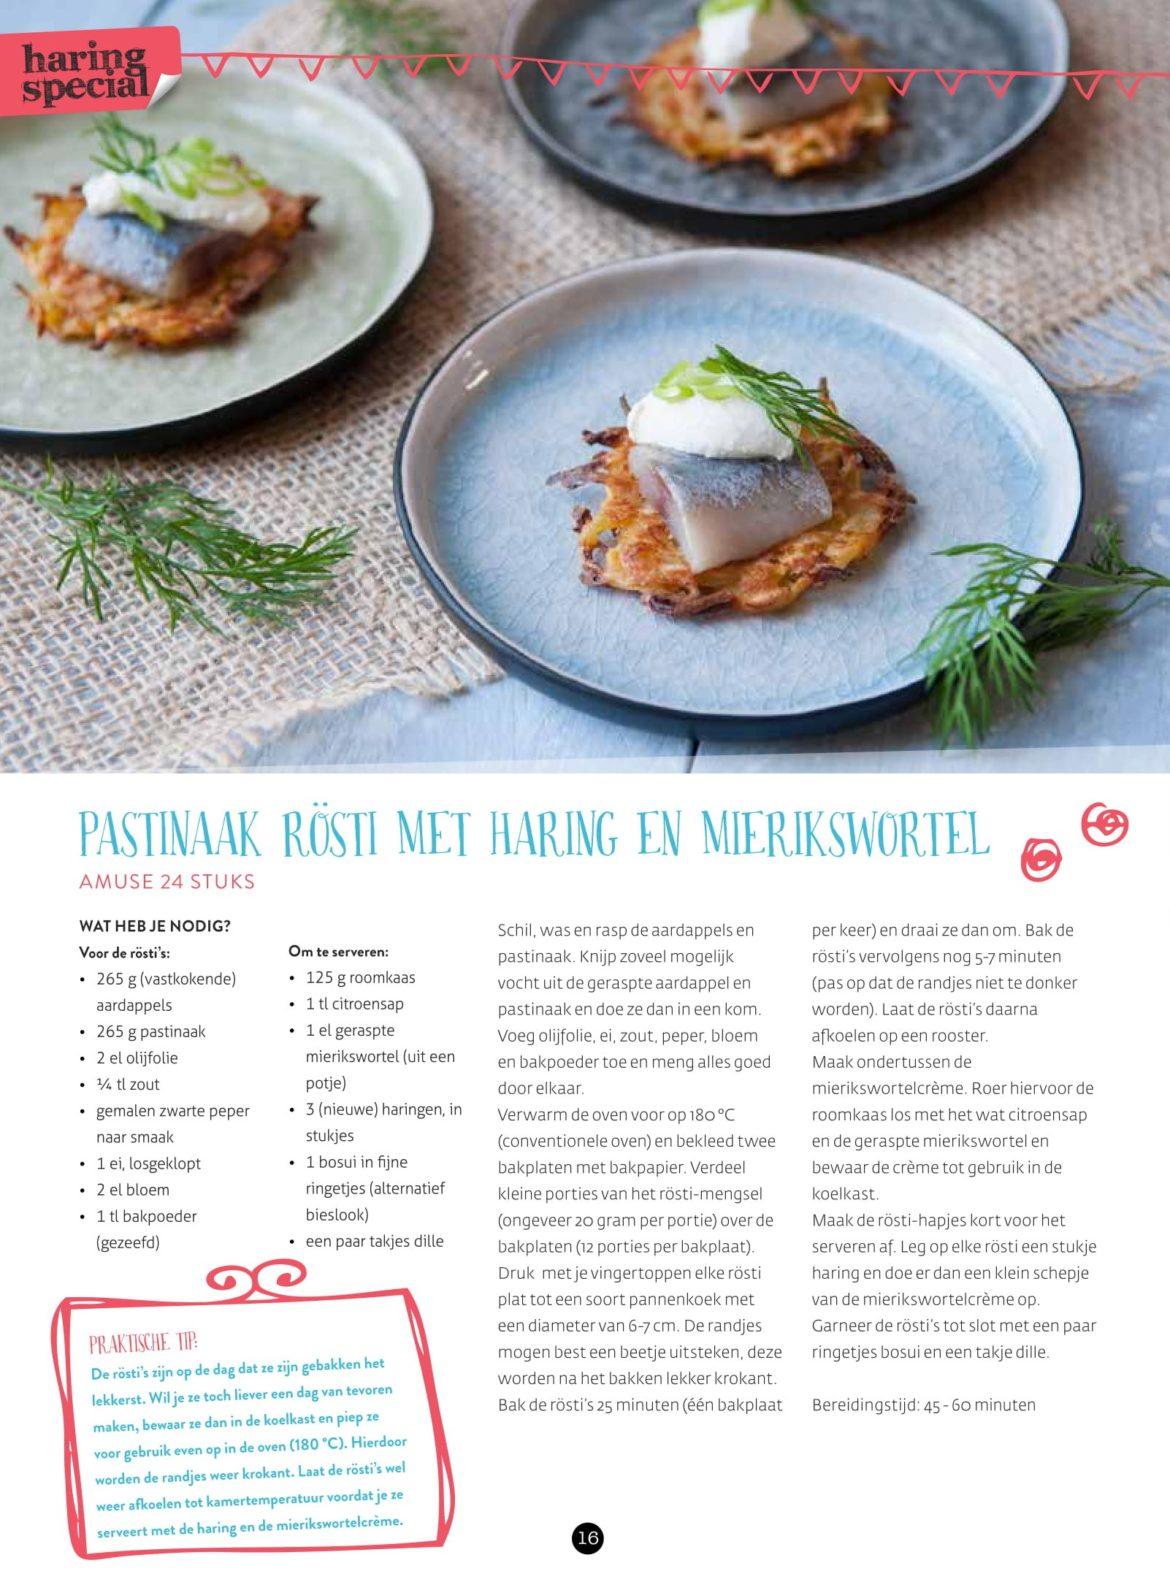 VisCulinair Magazine Pastinaak rosti met haring